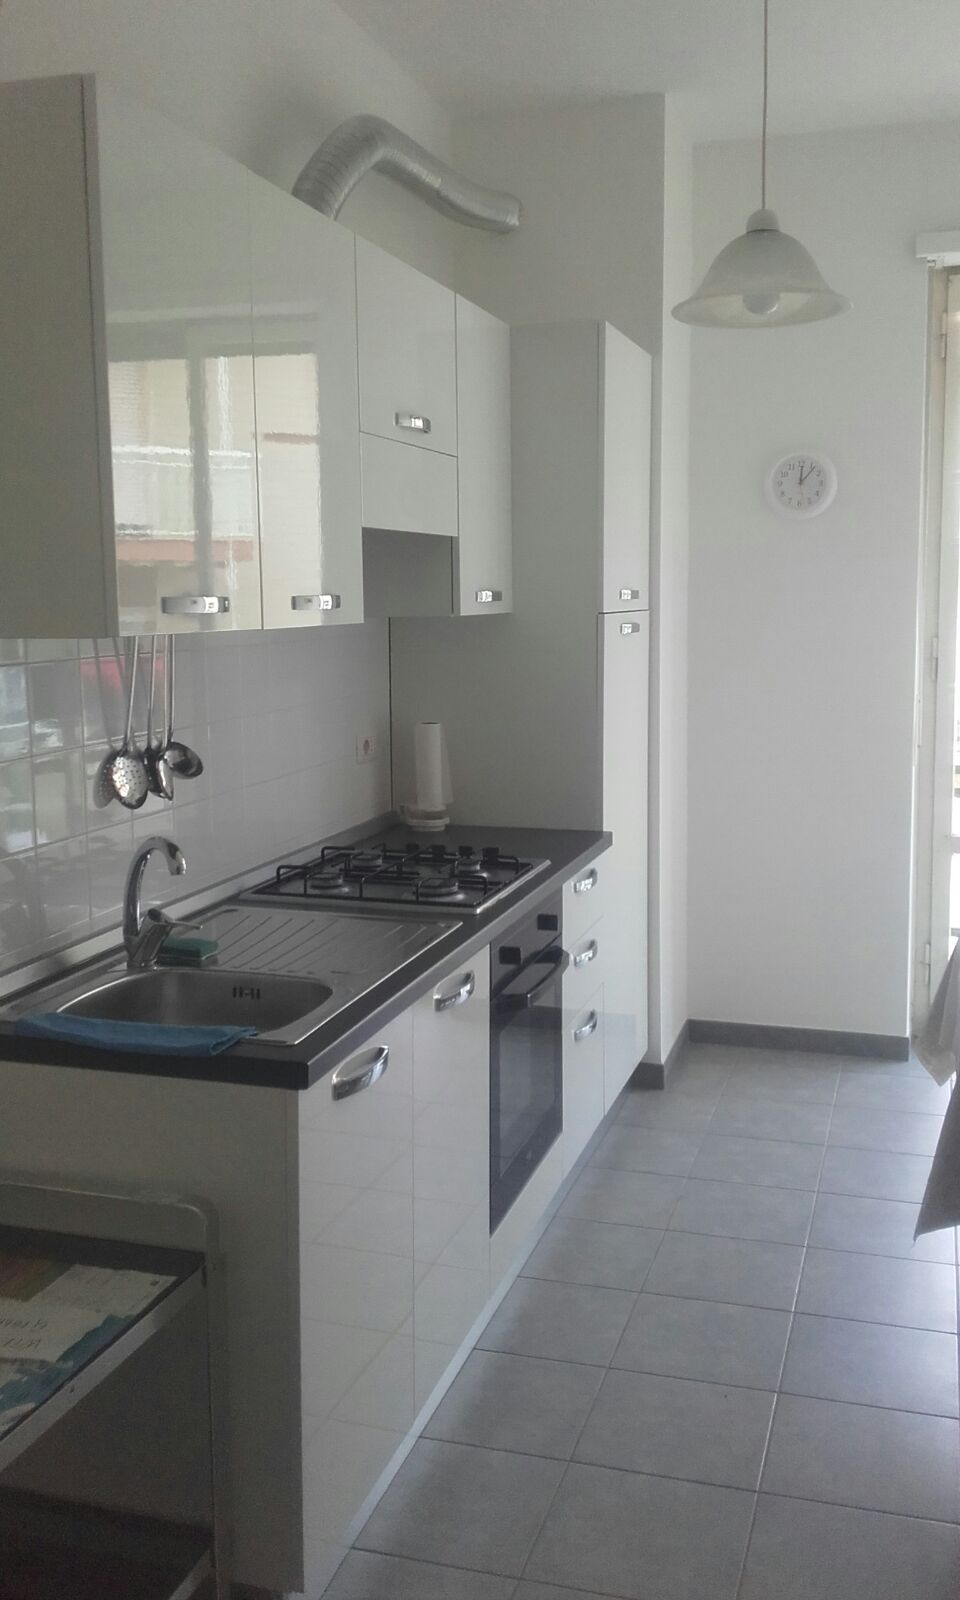 Kitchen of Cagliari Holiday Home Saturnino 103